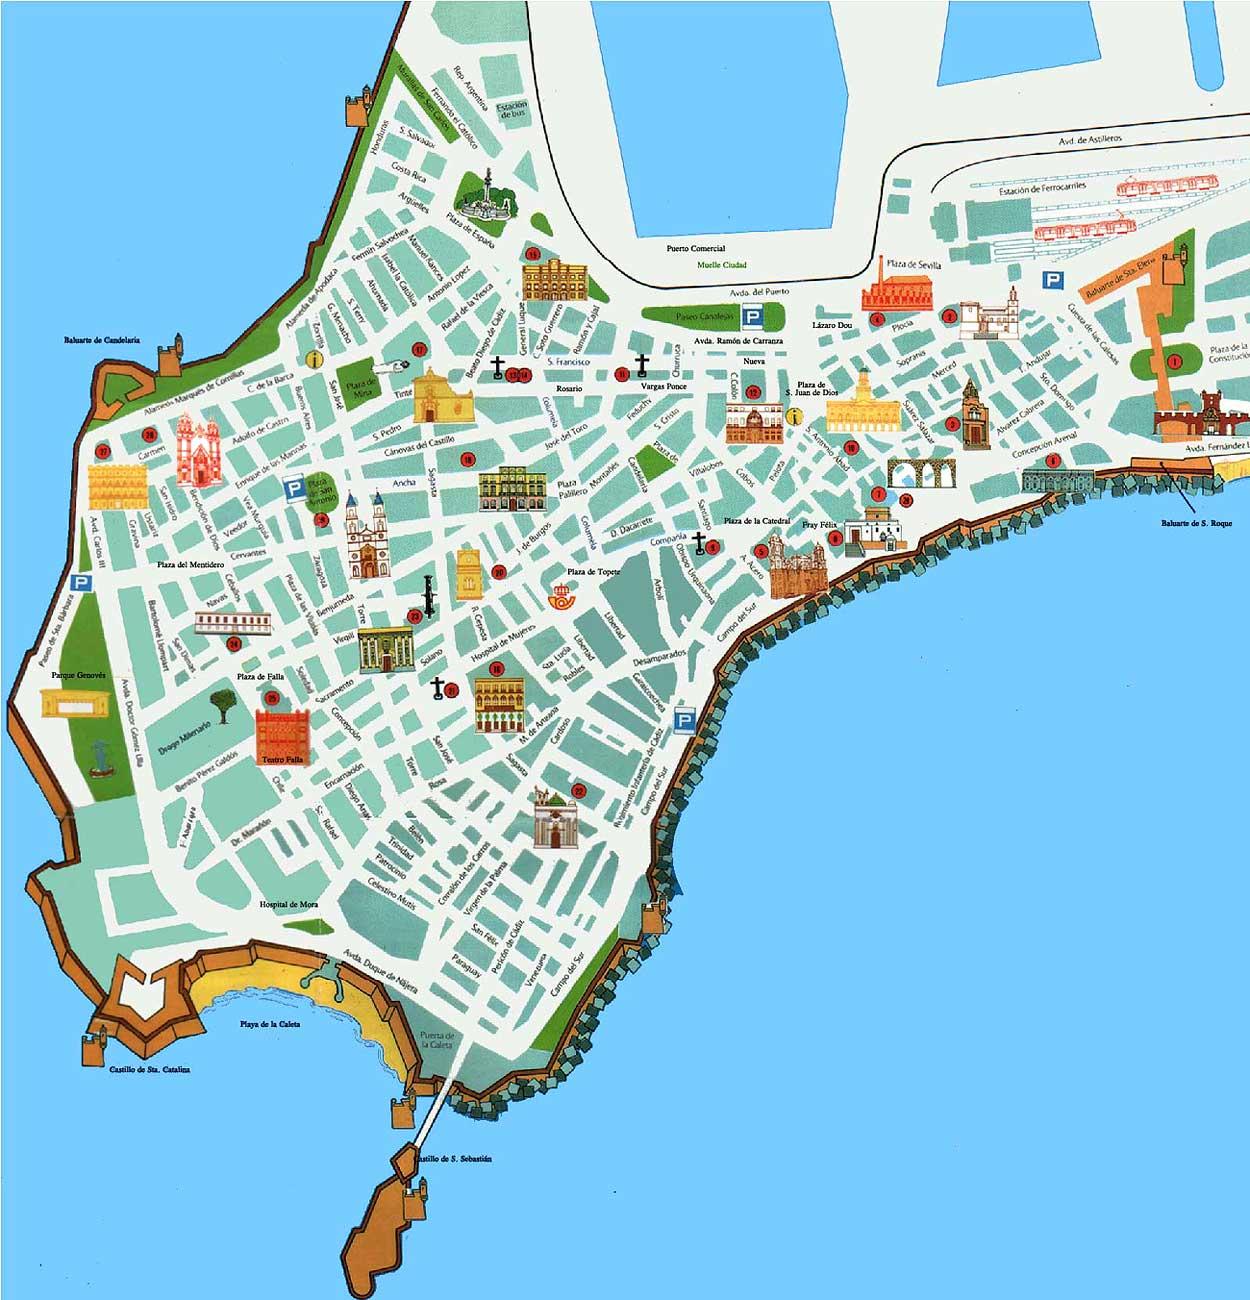 Map Of Spain Cadiz.Cadiz Tourism Map Regional Map Of Spain Tourism Region And Topography